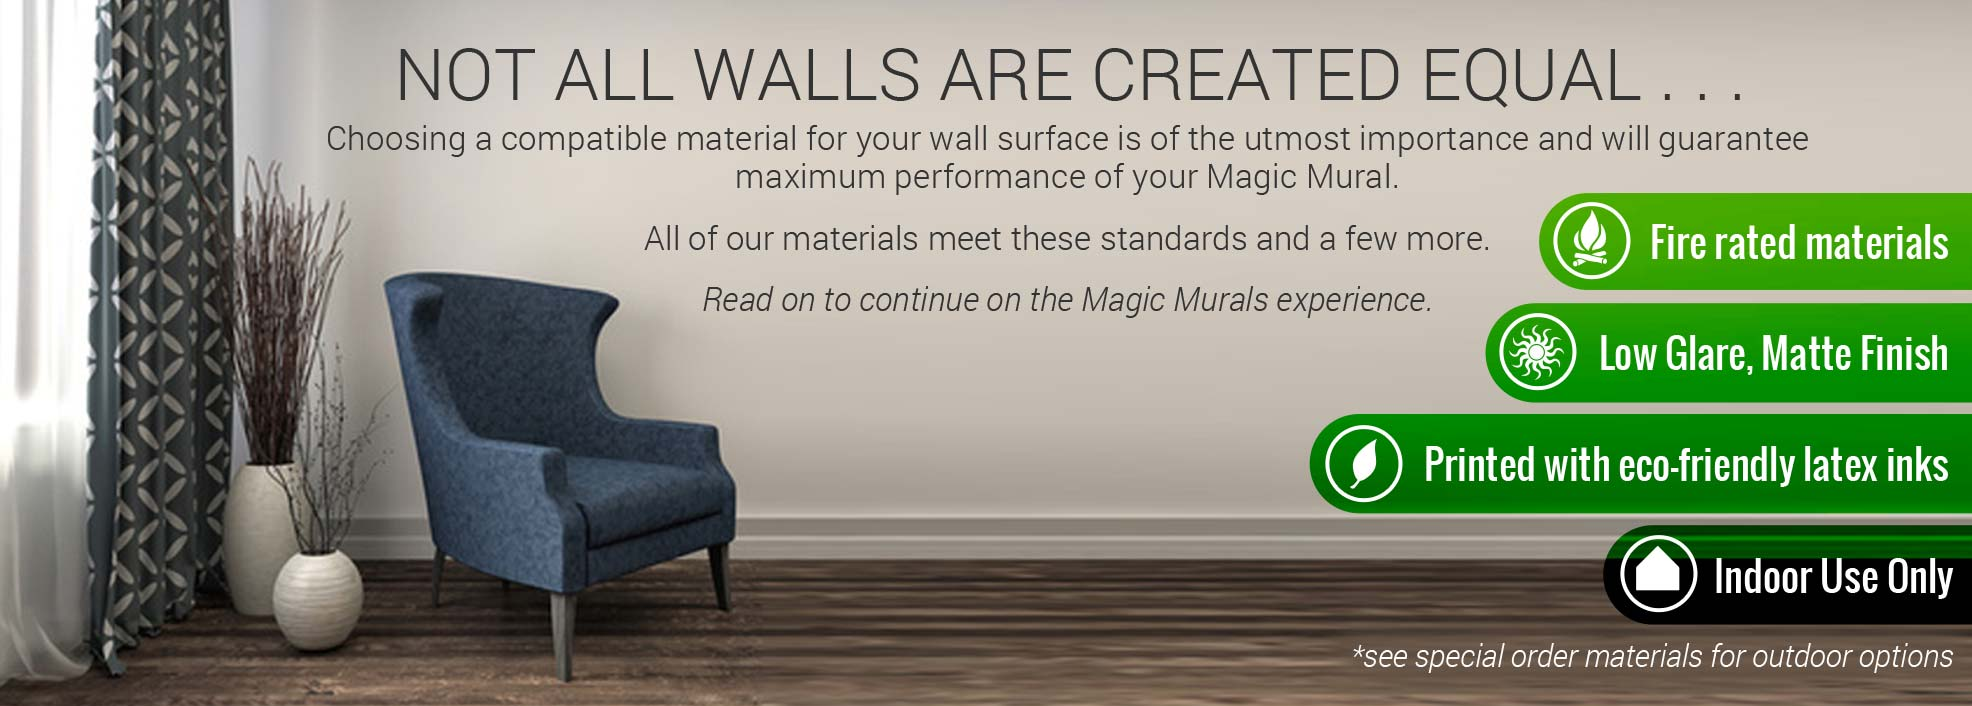 Compare Mural Materials